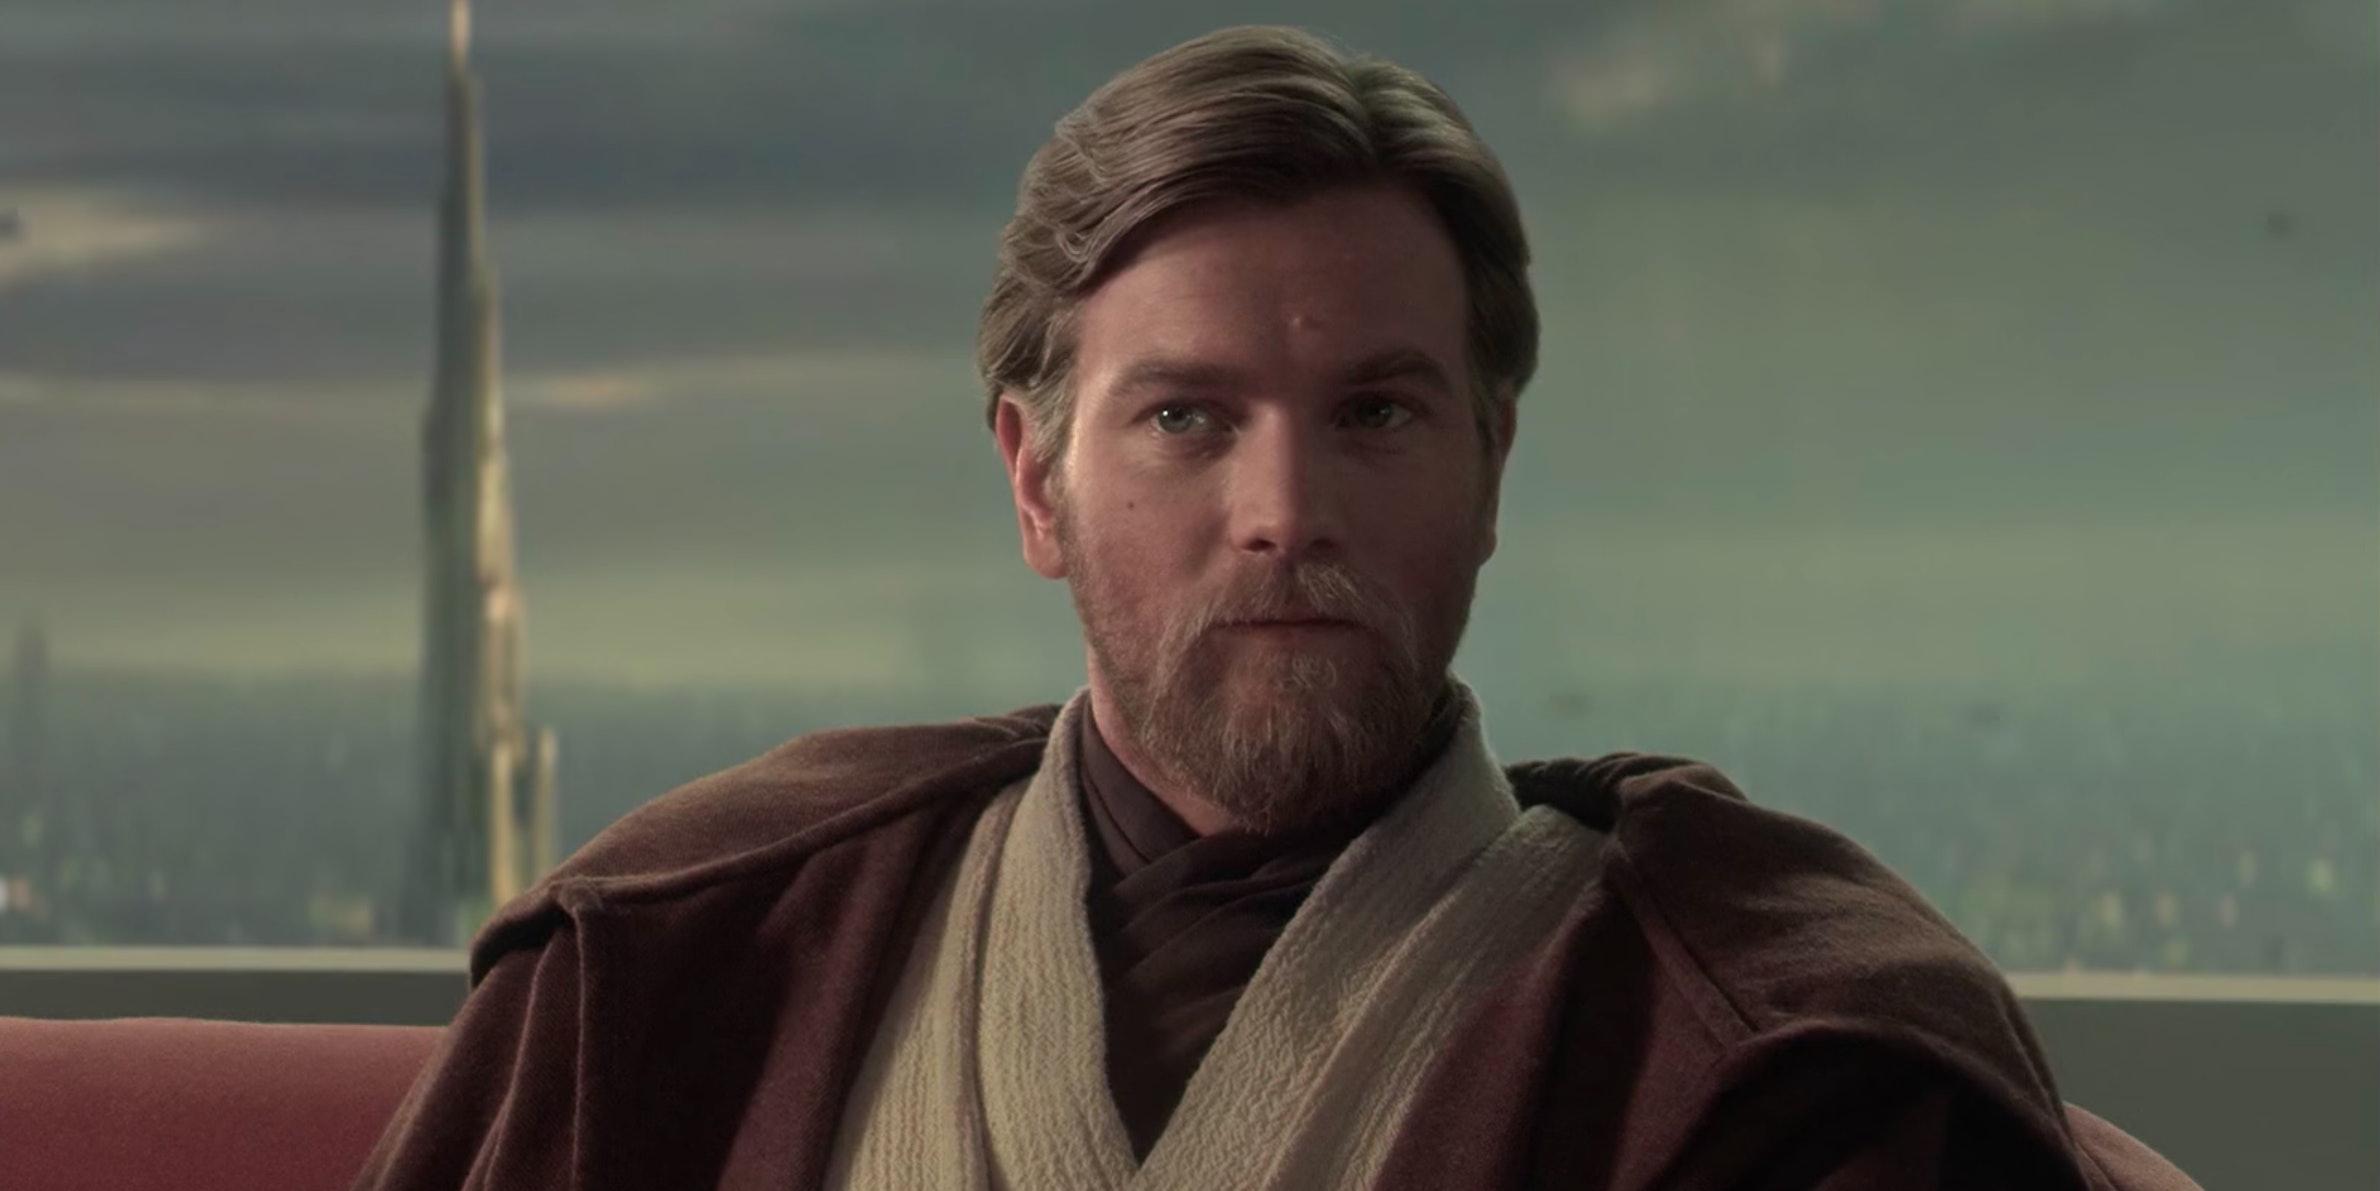 Ewan McGregor Dispels Rumors of Obi-Wan Kenobi Star Wars Movie